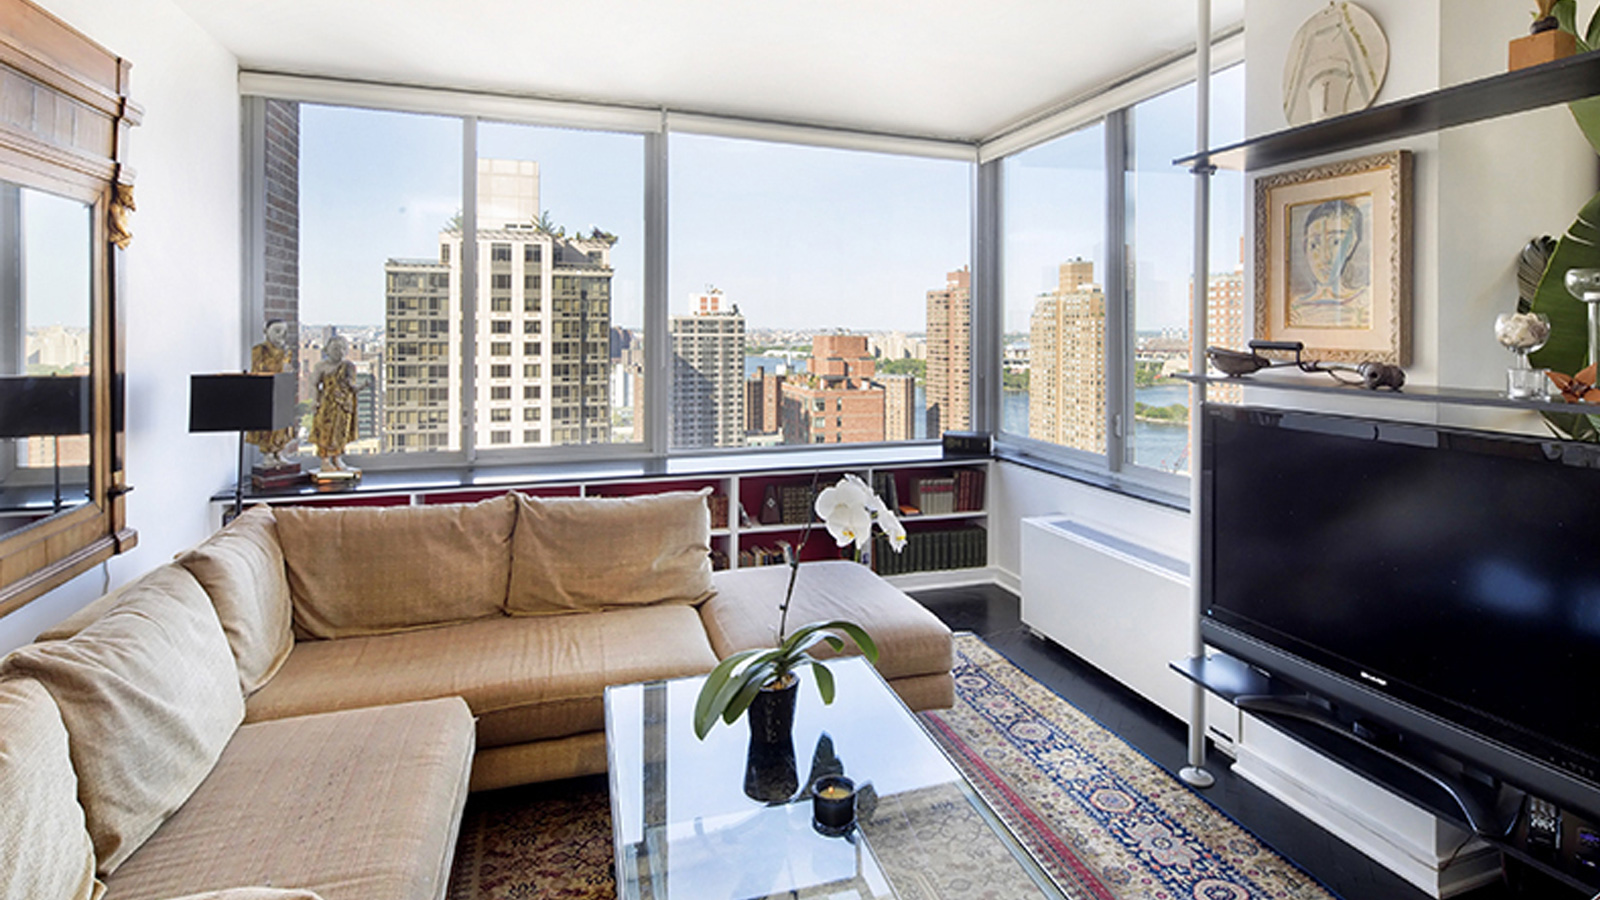 Leighton House 360 East 88th Street Nyc Condo Apartments Cityrealty